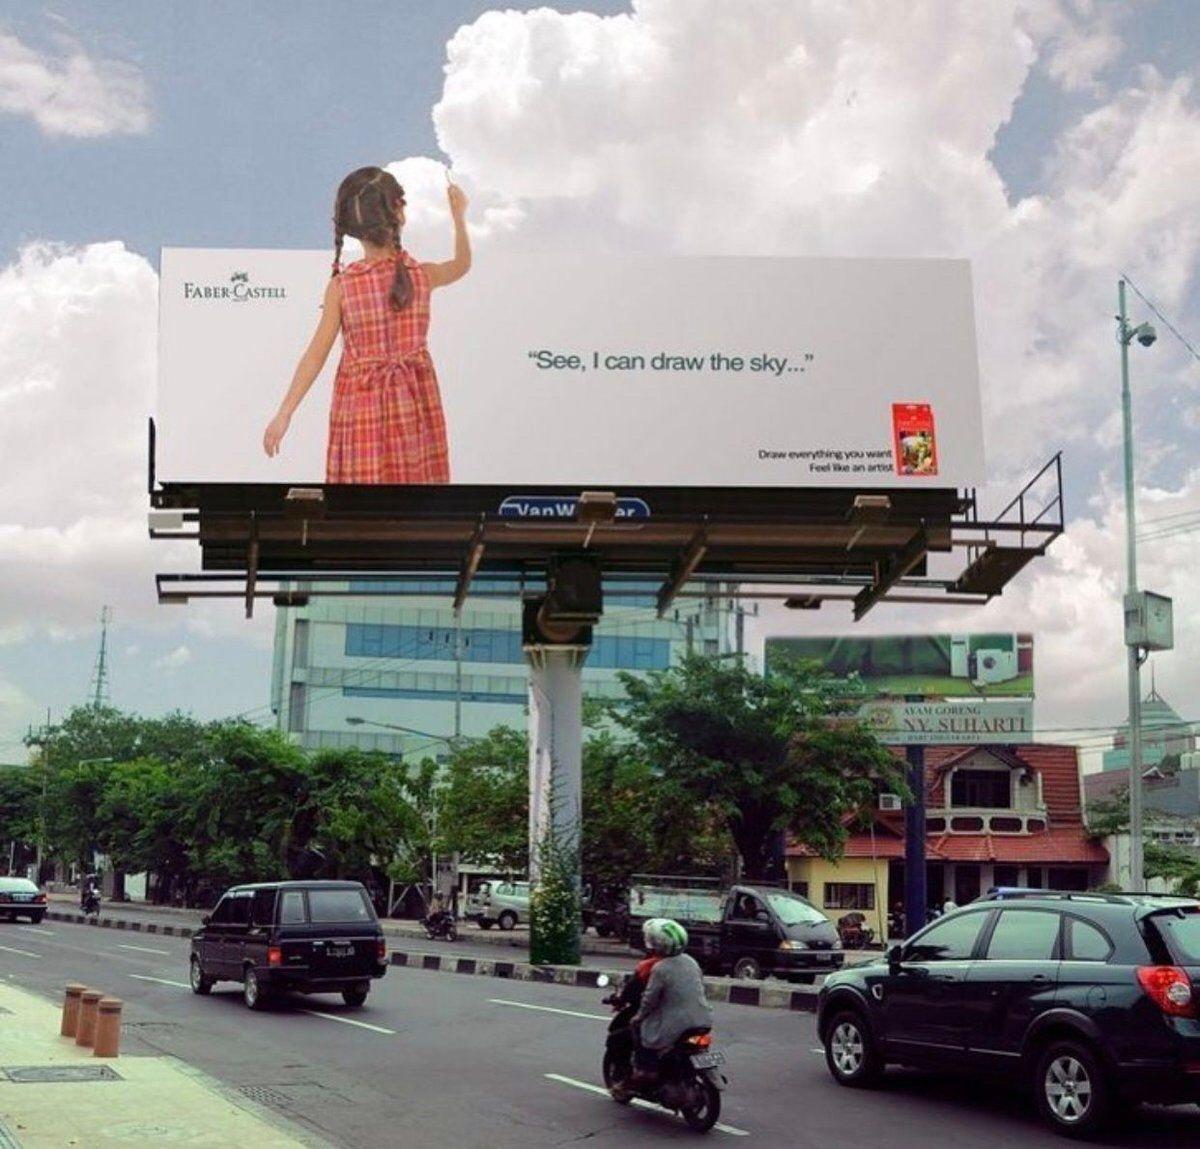 Faber-Castell billboard